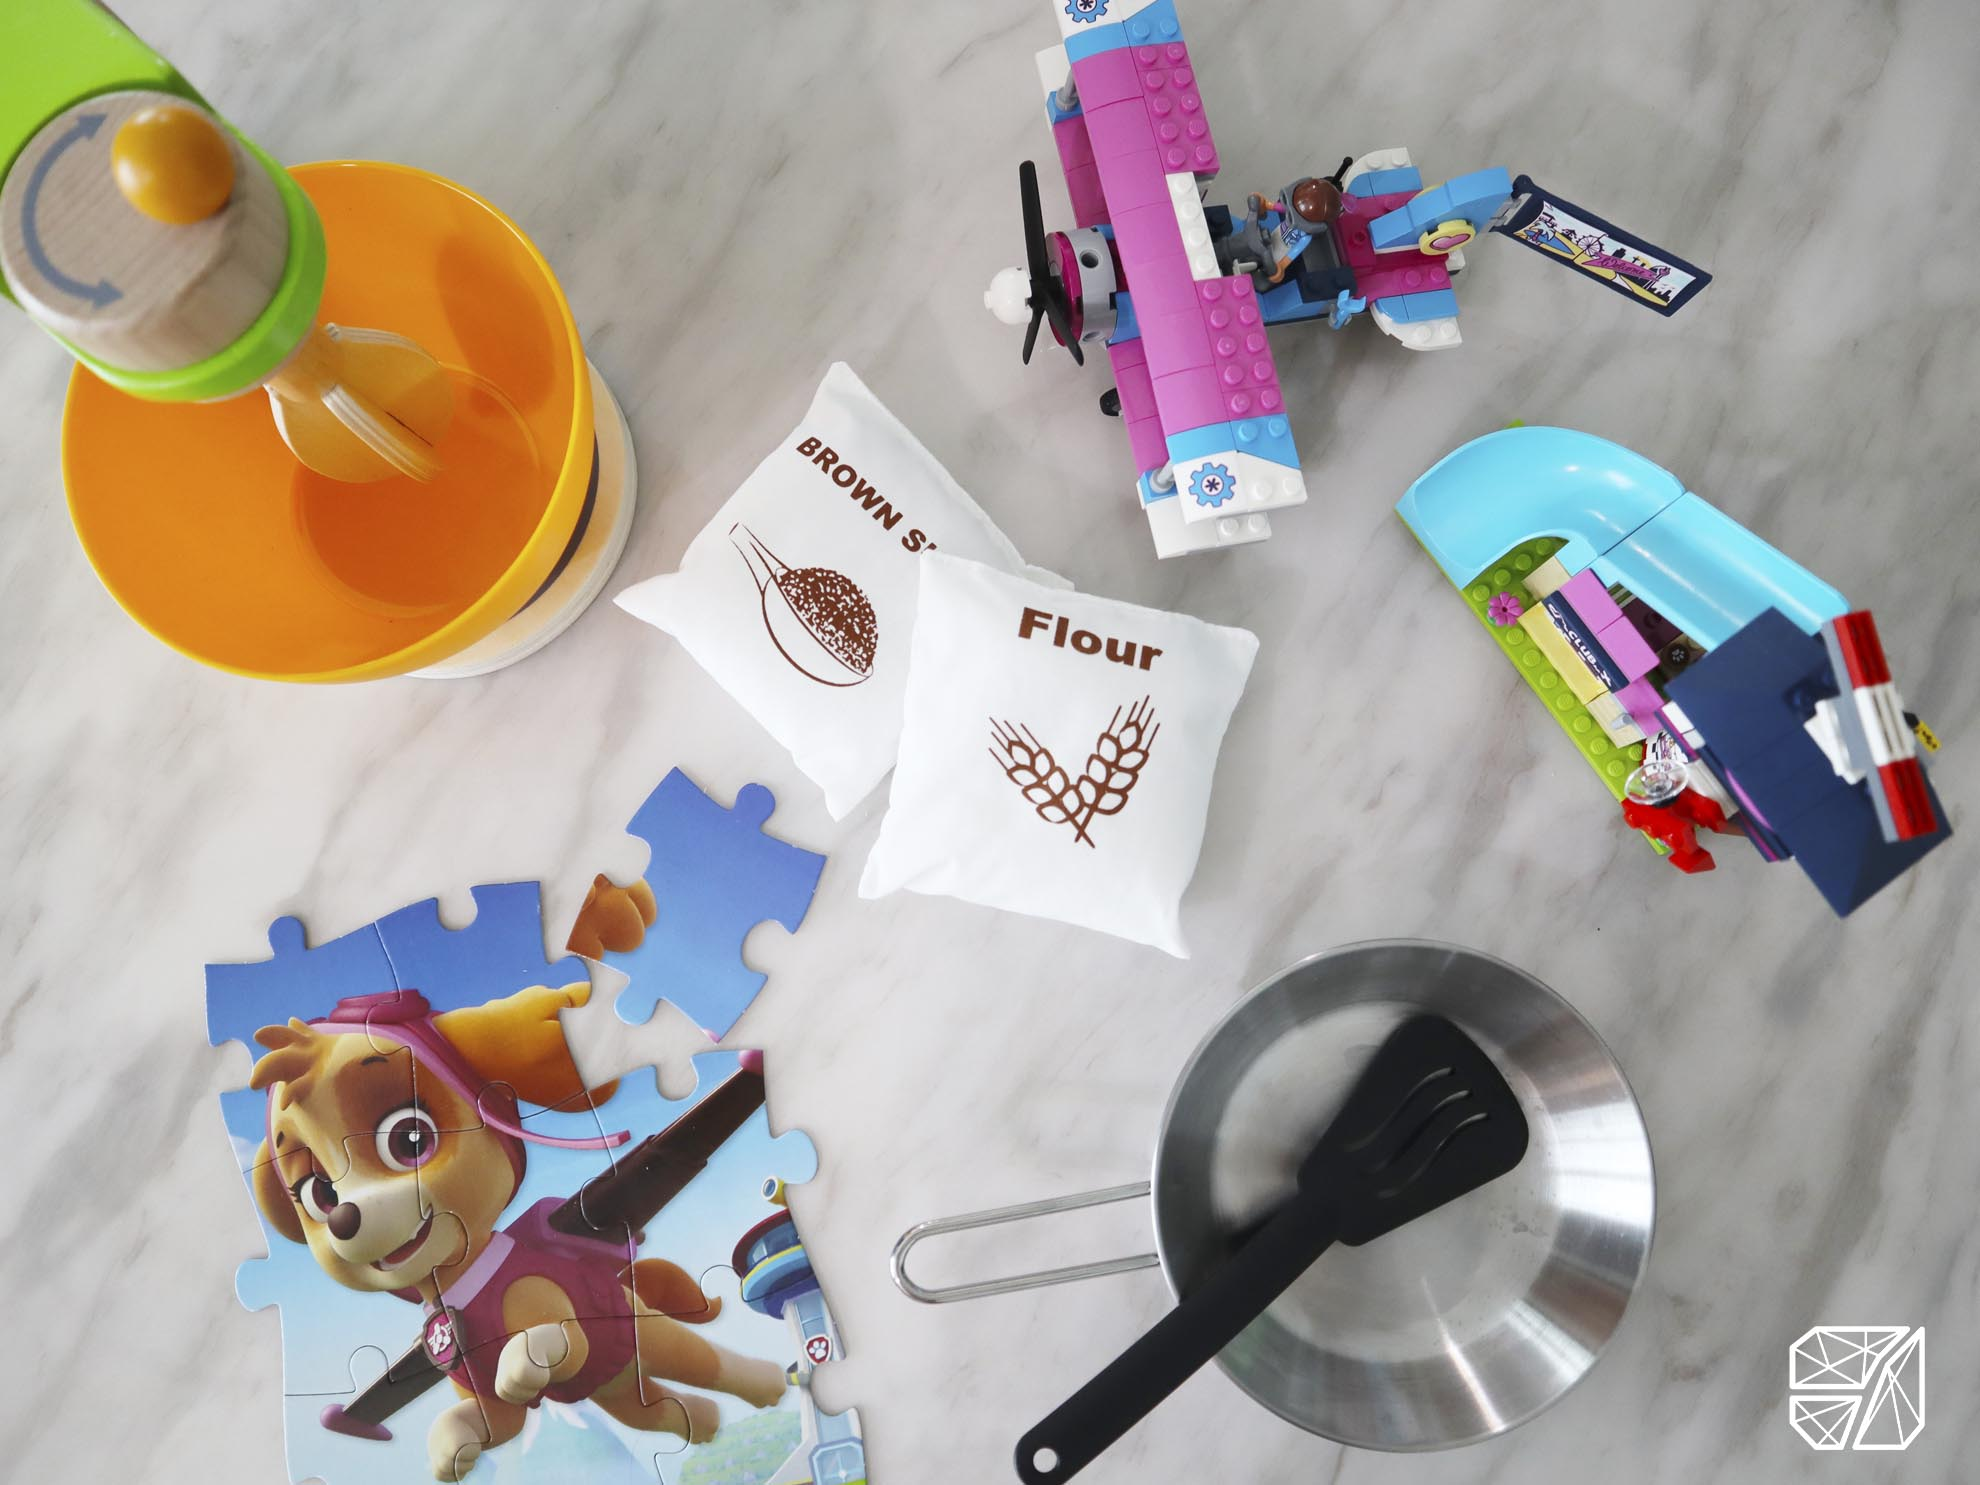 Jigsaw puzzle, baking tools, Lego blocks, frying pan and spatula